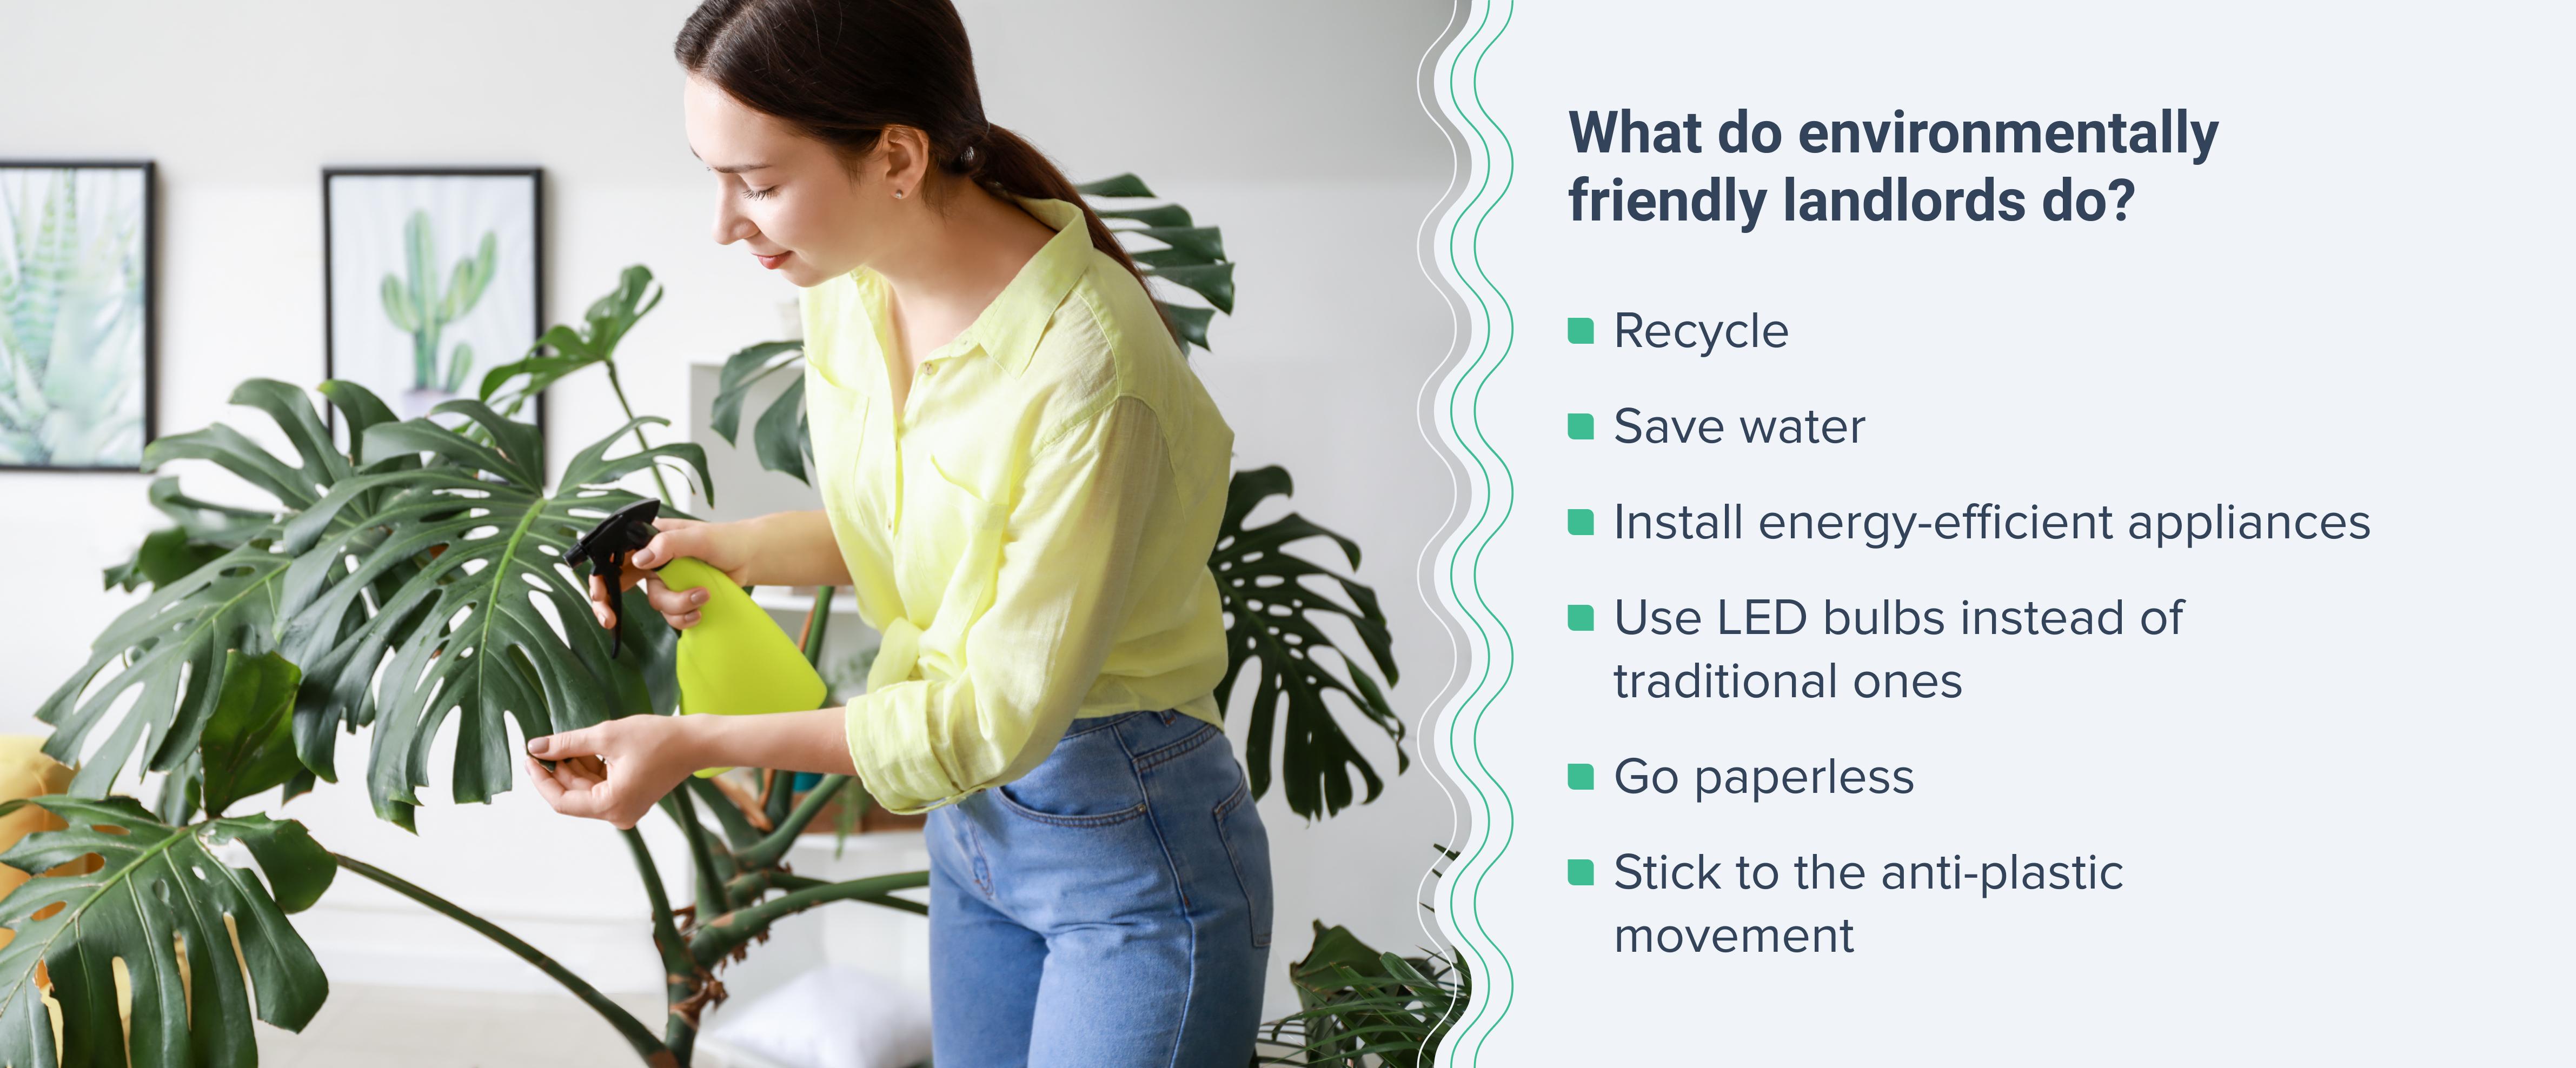 Environmentally friendly landlords